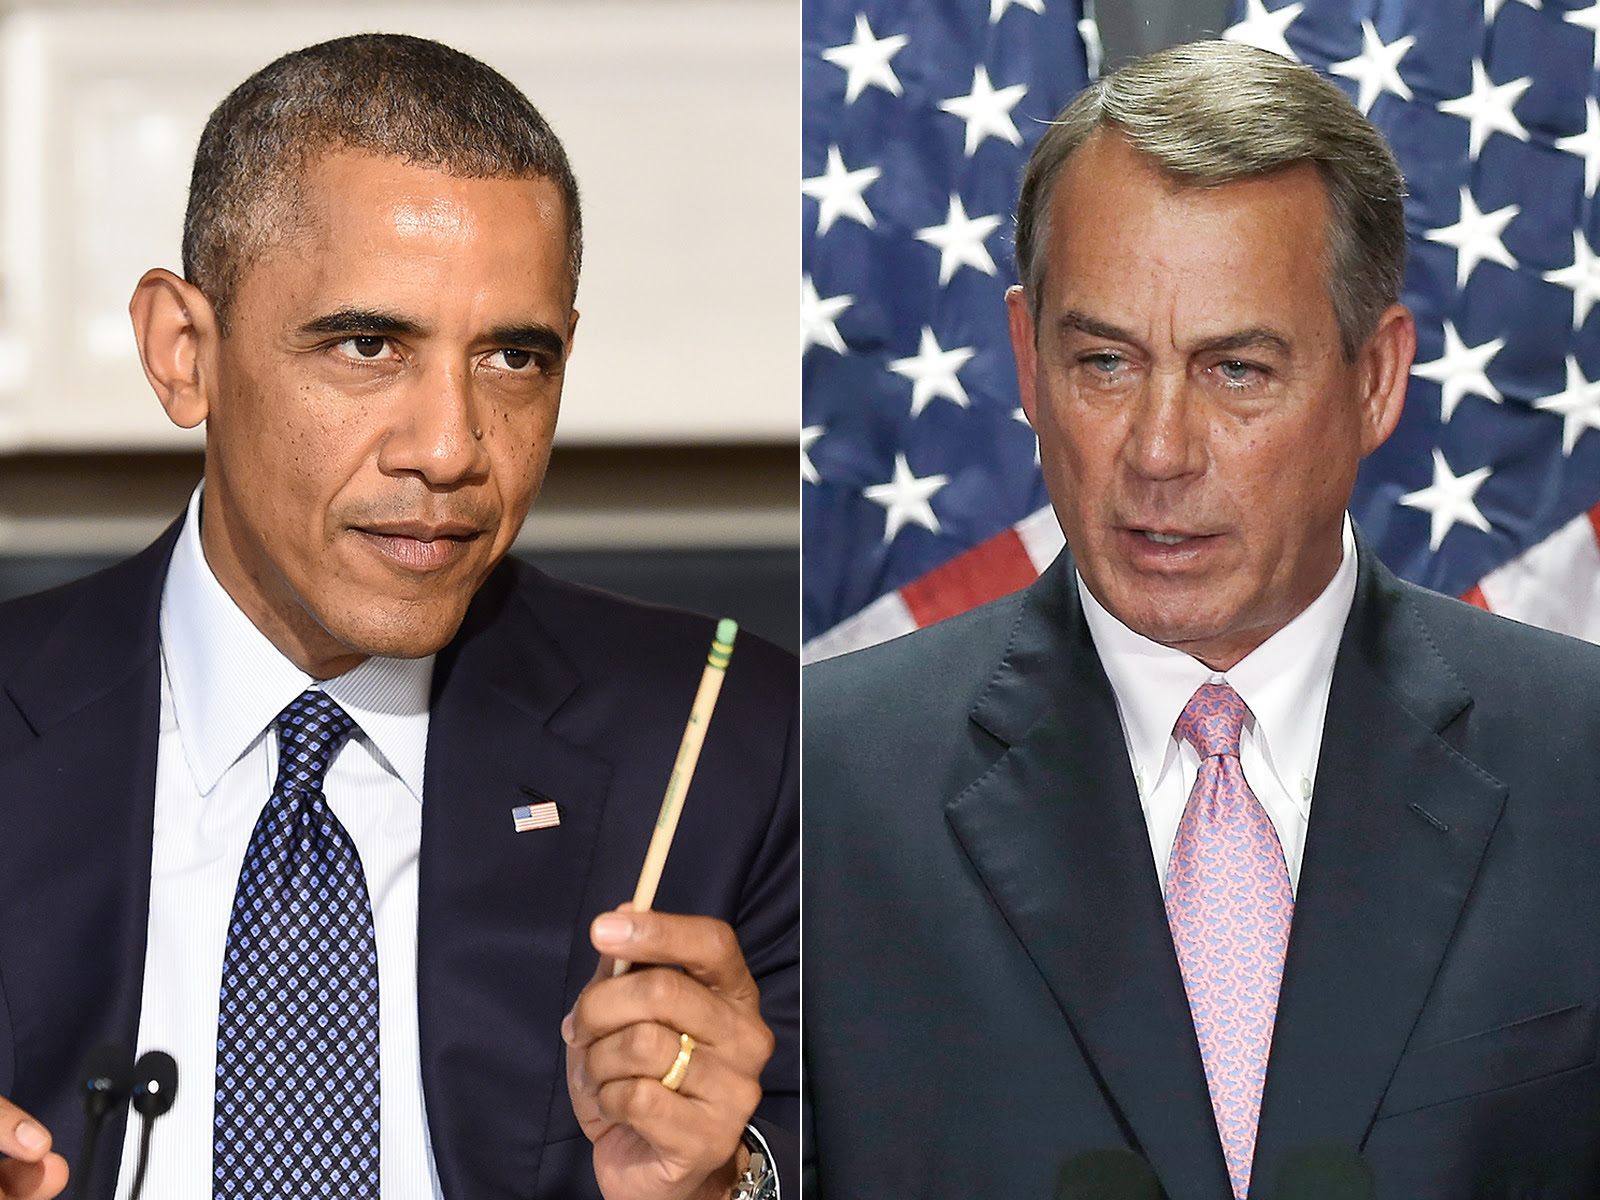 GTY barack obama john boehner split main jt 140727 1 Boehner v. Obama: House Approves Resolution to Sue President